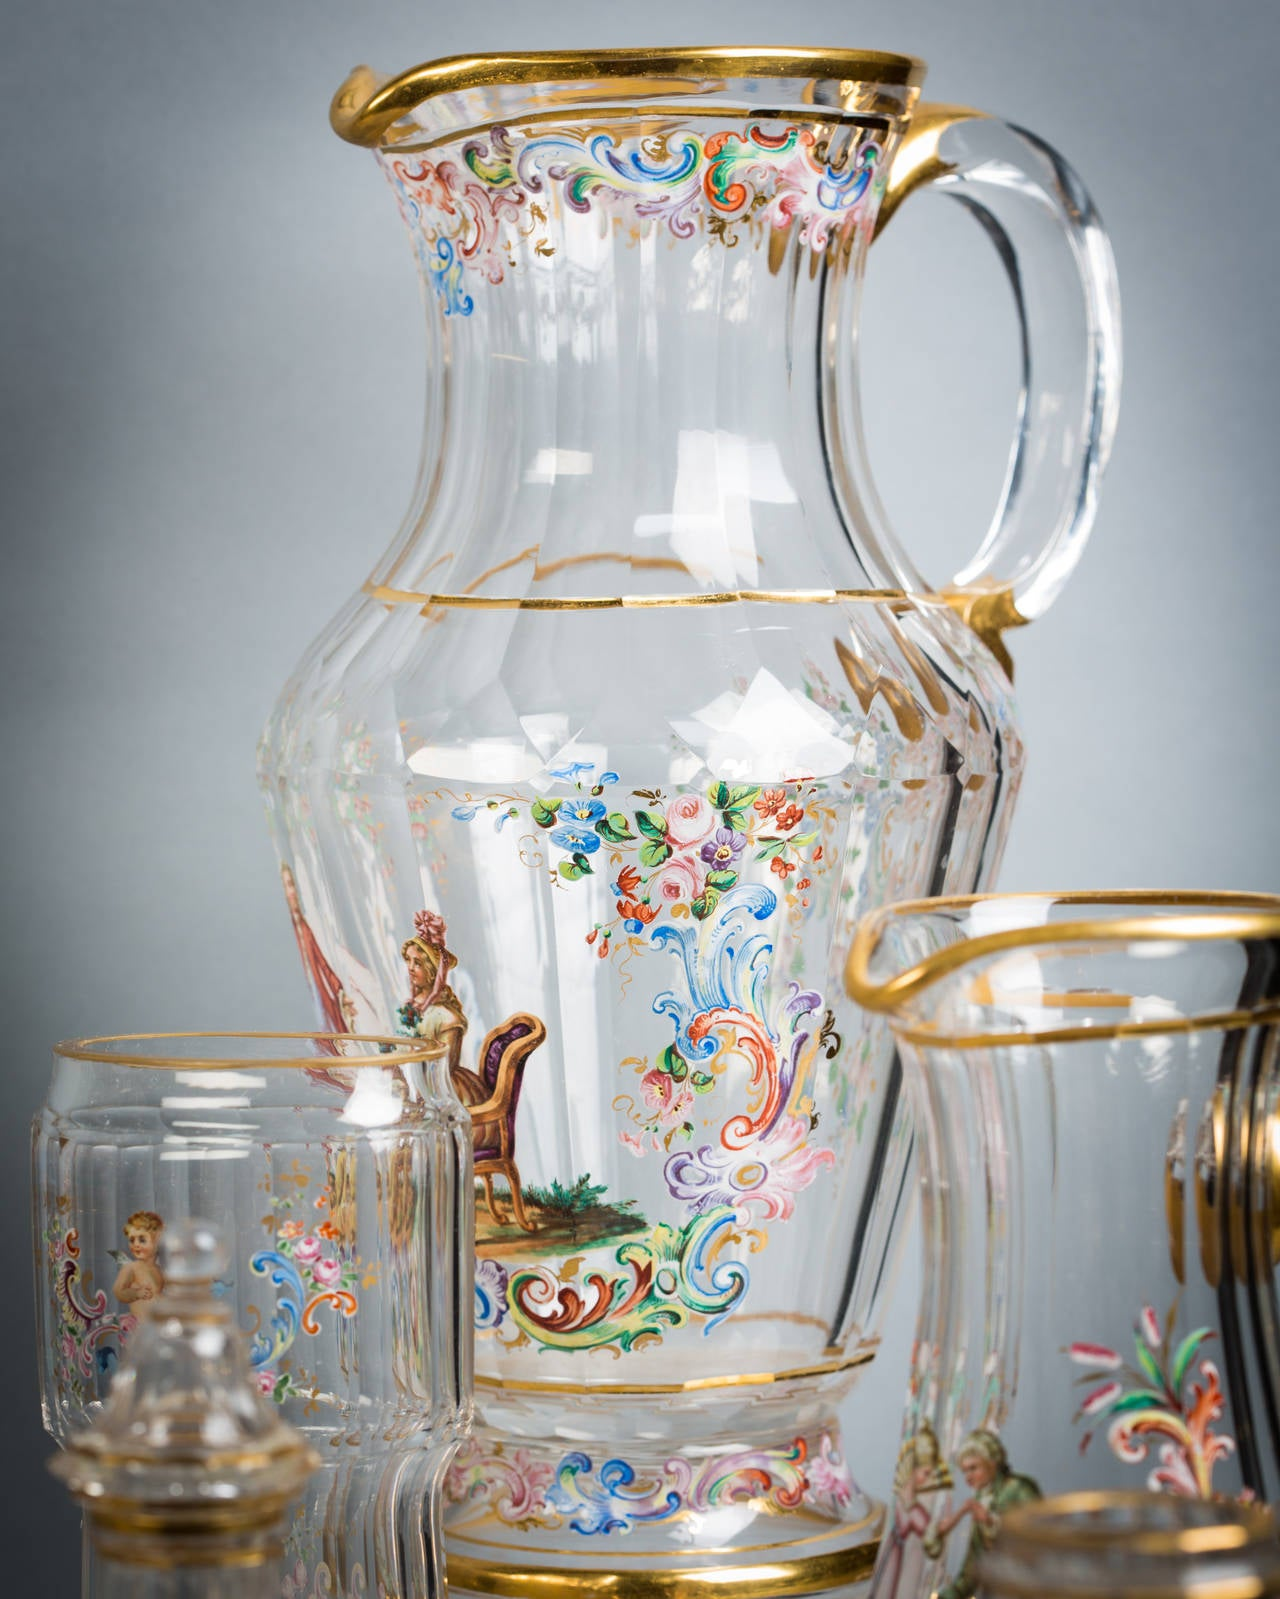 Austrian Enamel Table Glassware, Lobmeyr, circa 1890 For Sale 1